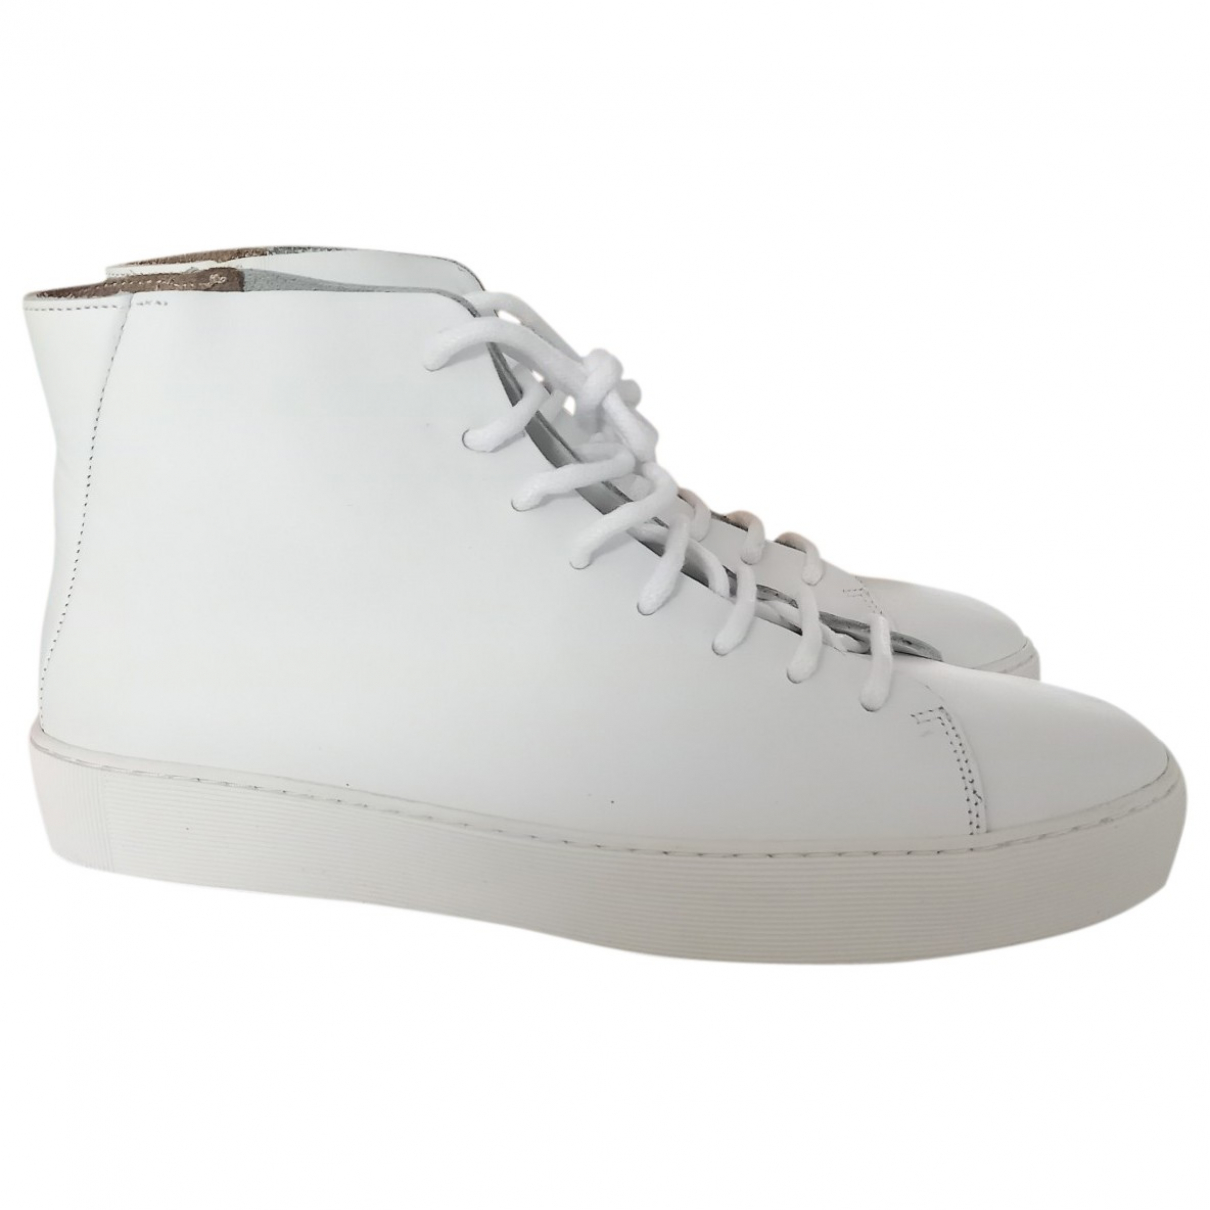 Royal Republiq \N Sneakers in  Weiss Leder